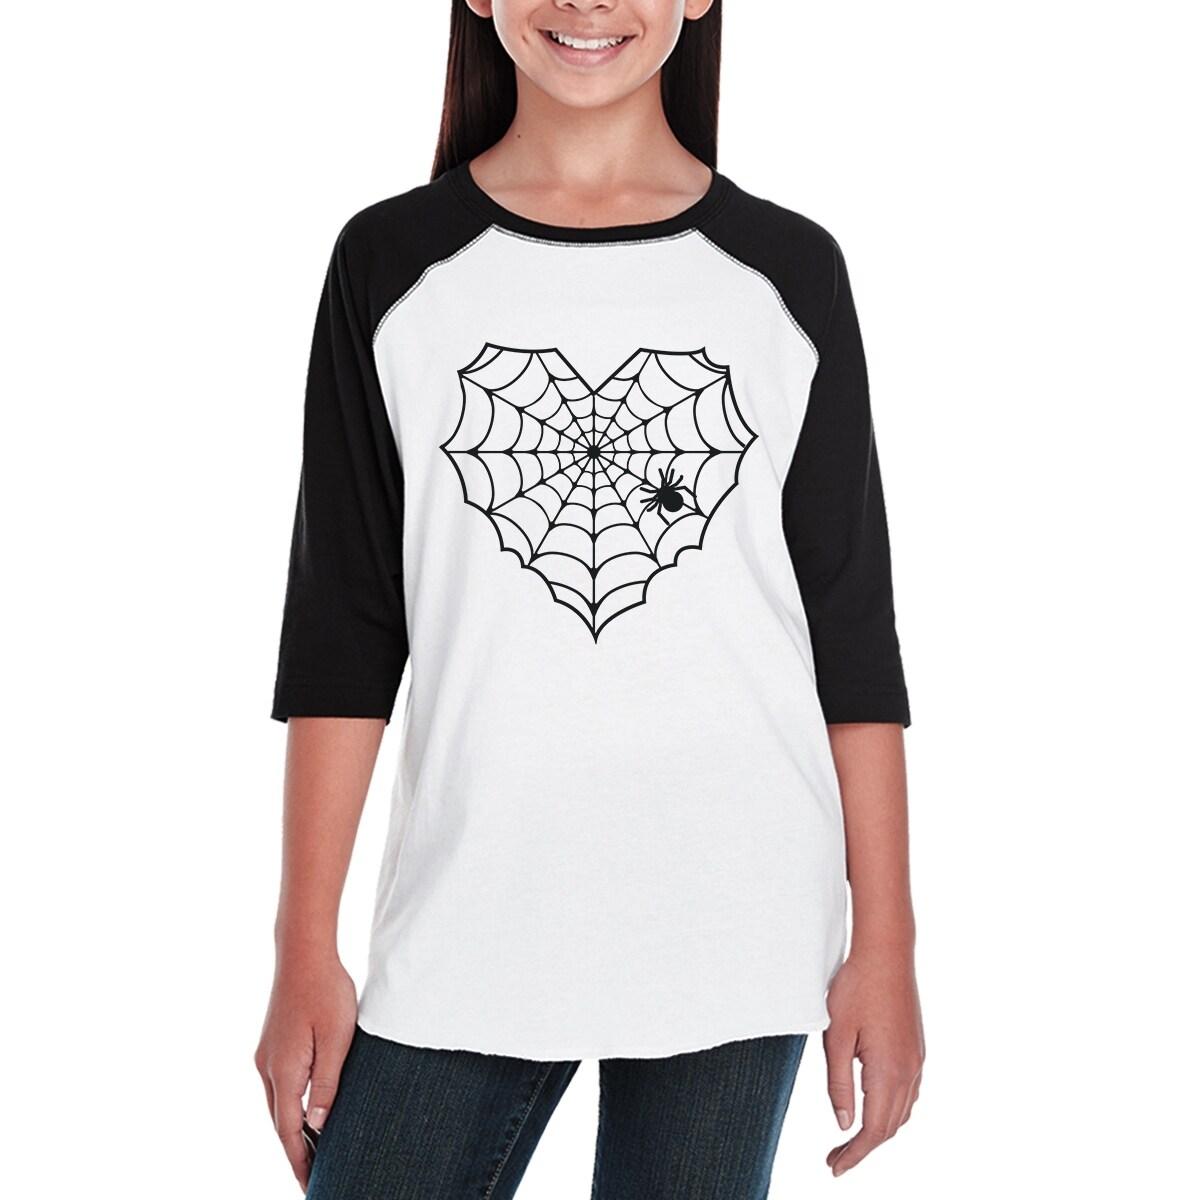 7ae12cda Shop Heart Spider Web Halloween Tshirt Youth Baseball Shirt Black Sleeve -  Free Shipping On Orders Over $45 - Overstock - 17745023